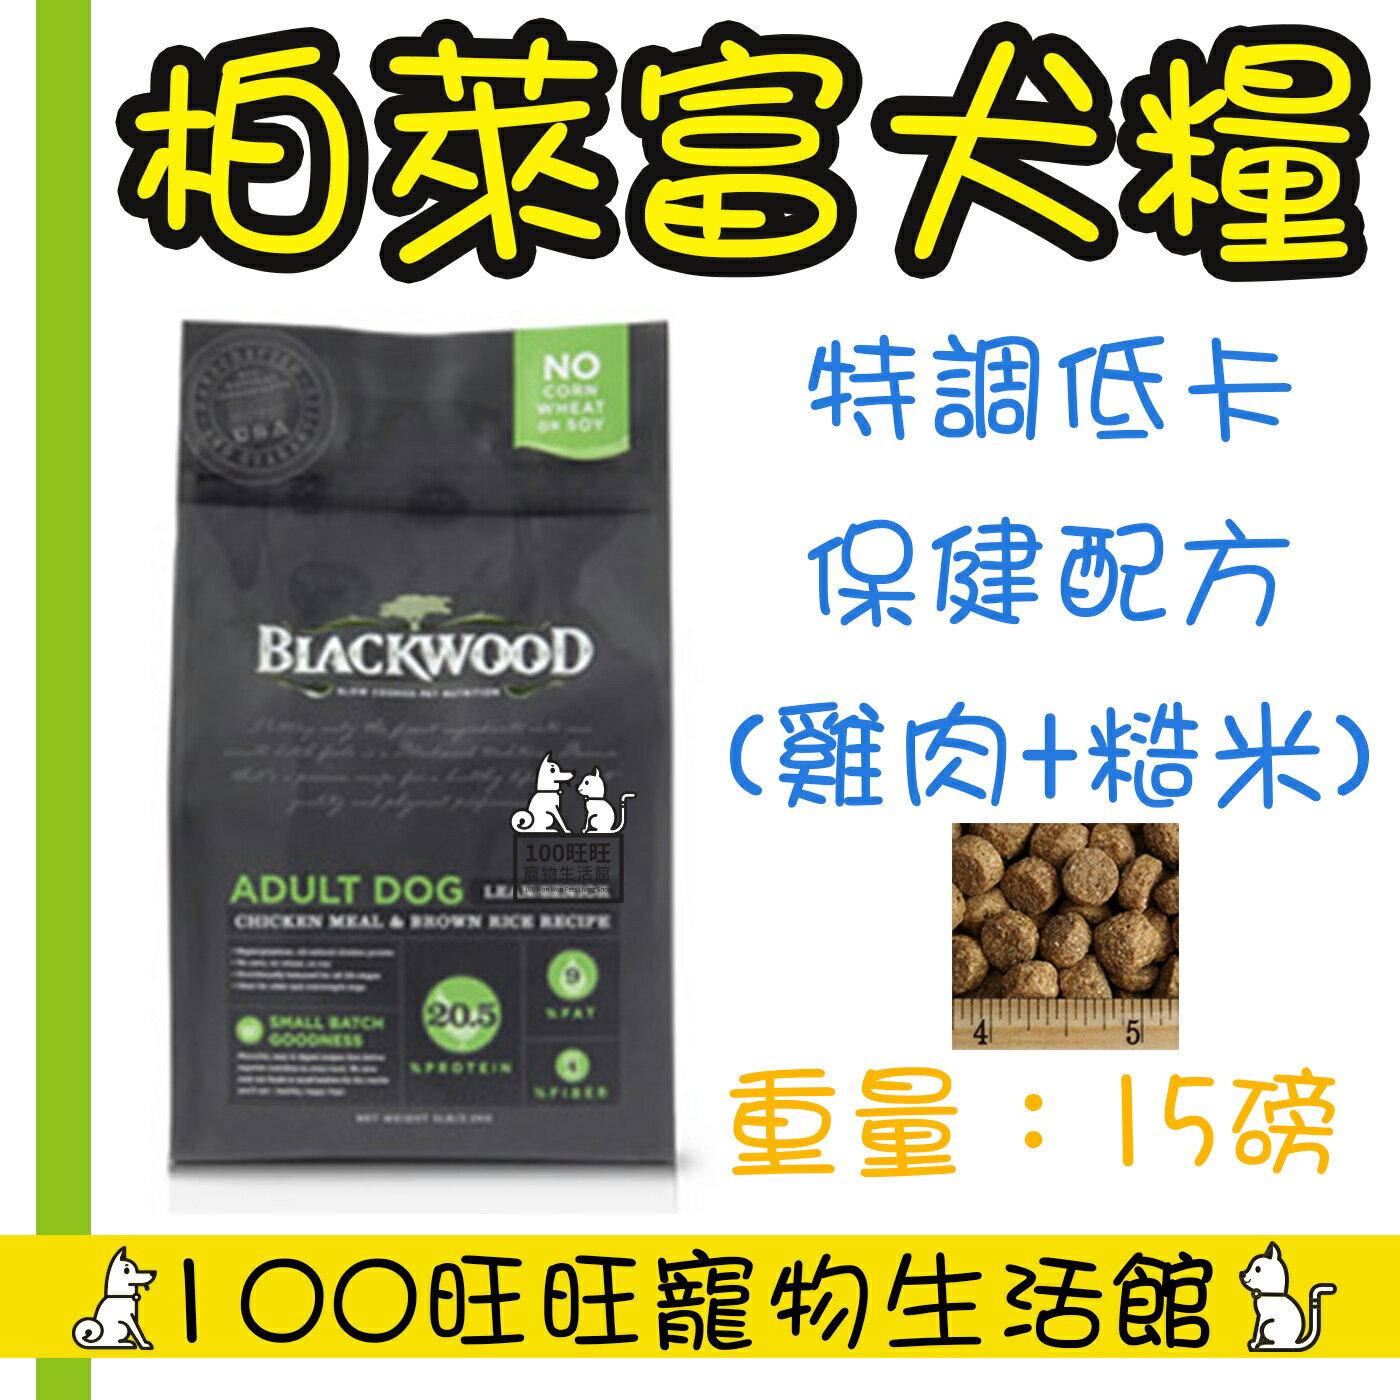 BLACKWOOD 柏萊富 特調低卡 保健配方 15lb (雞肉+糙米) 6.8kg